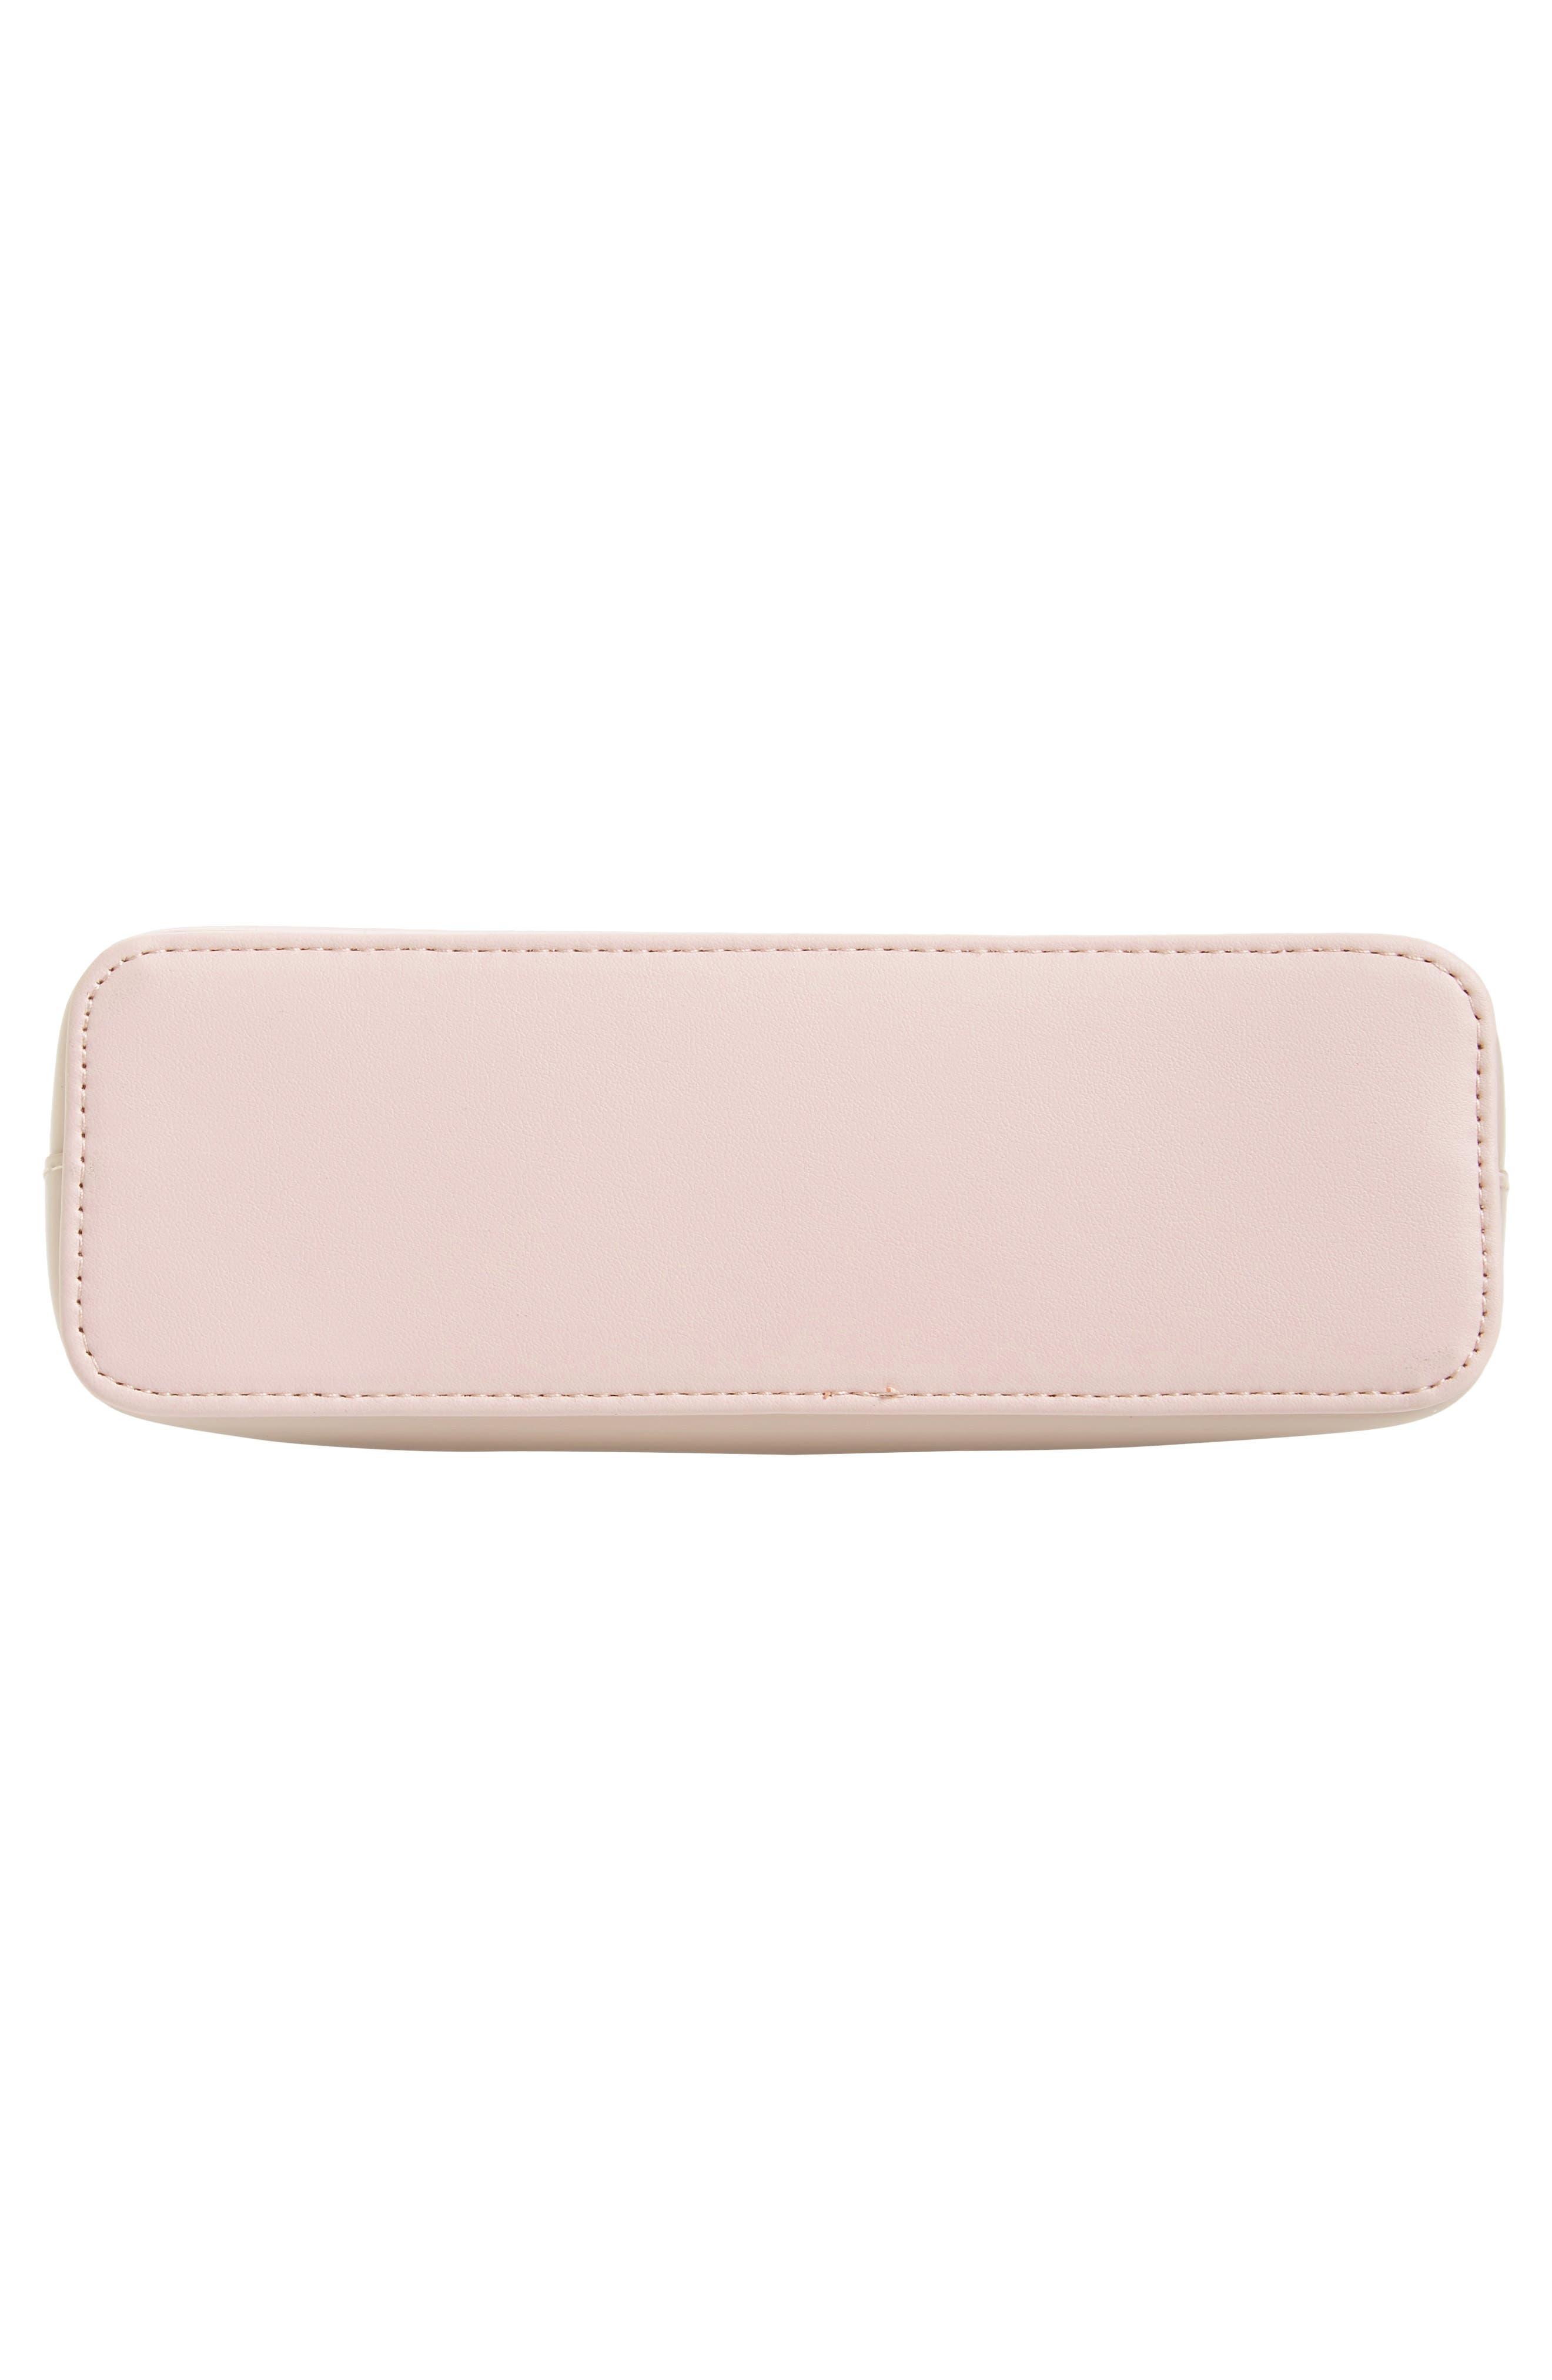 Celest Cosmetics Case & Cardholder Set,                             Alternate thumbnail 5, color,                             GREY